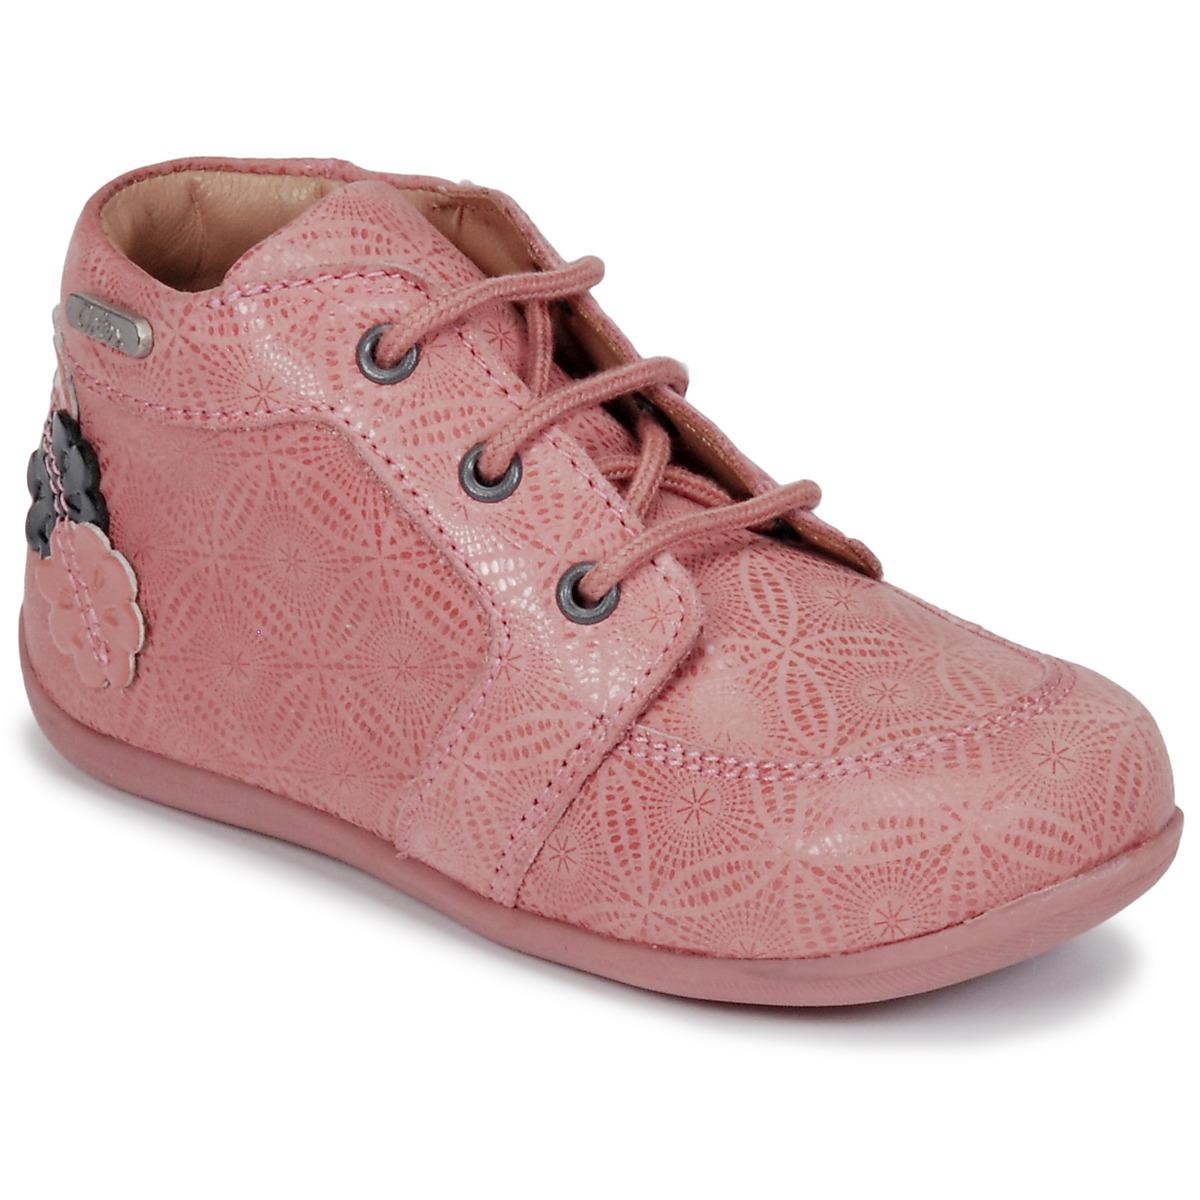 Støvler til børn Aster  DILA